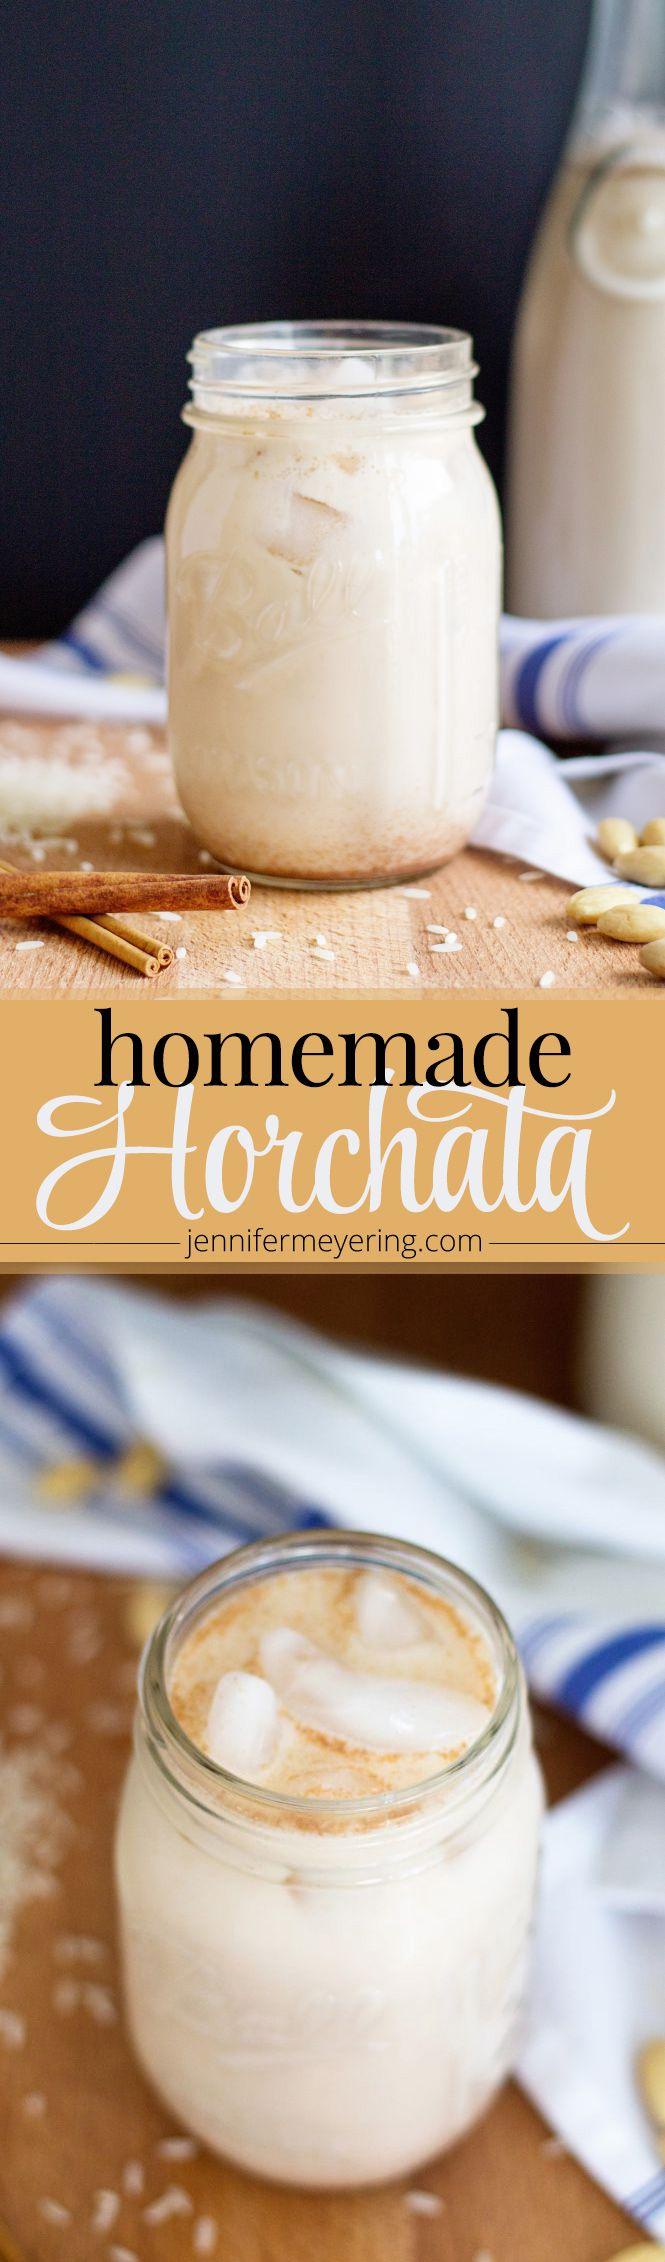 Homemade Horchata | JenniferMeyering.com                                                                                                                                                      More